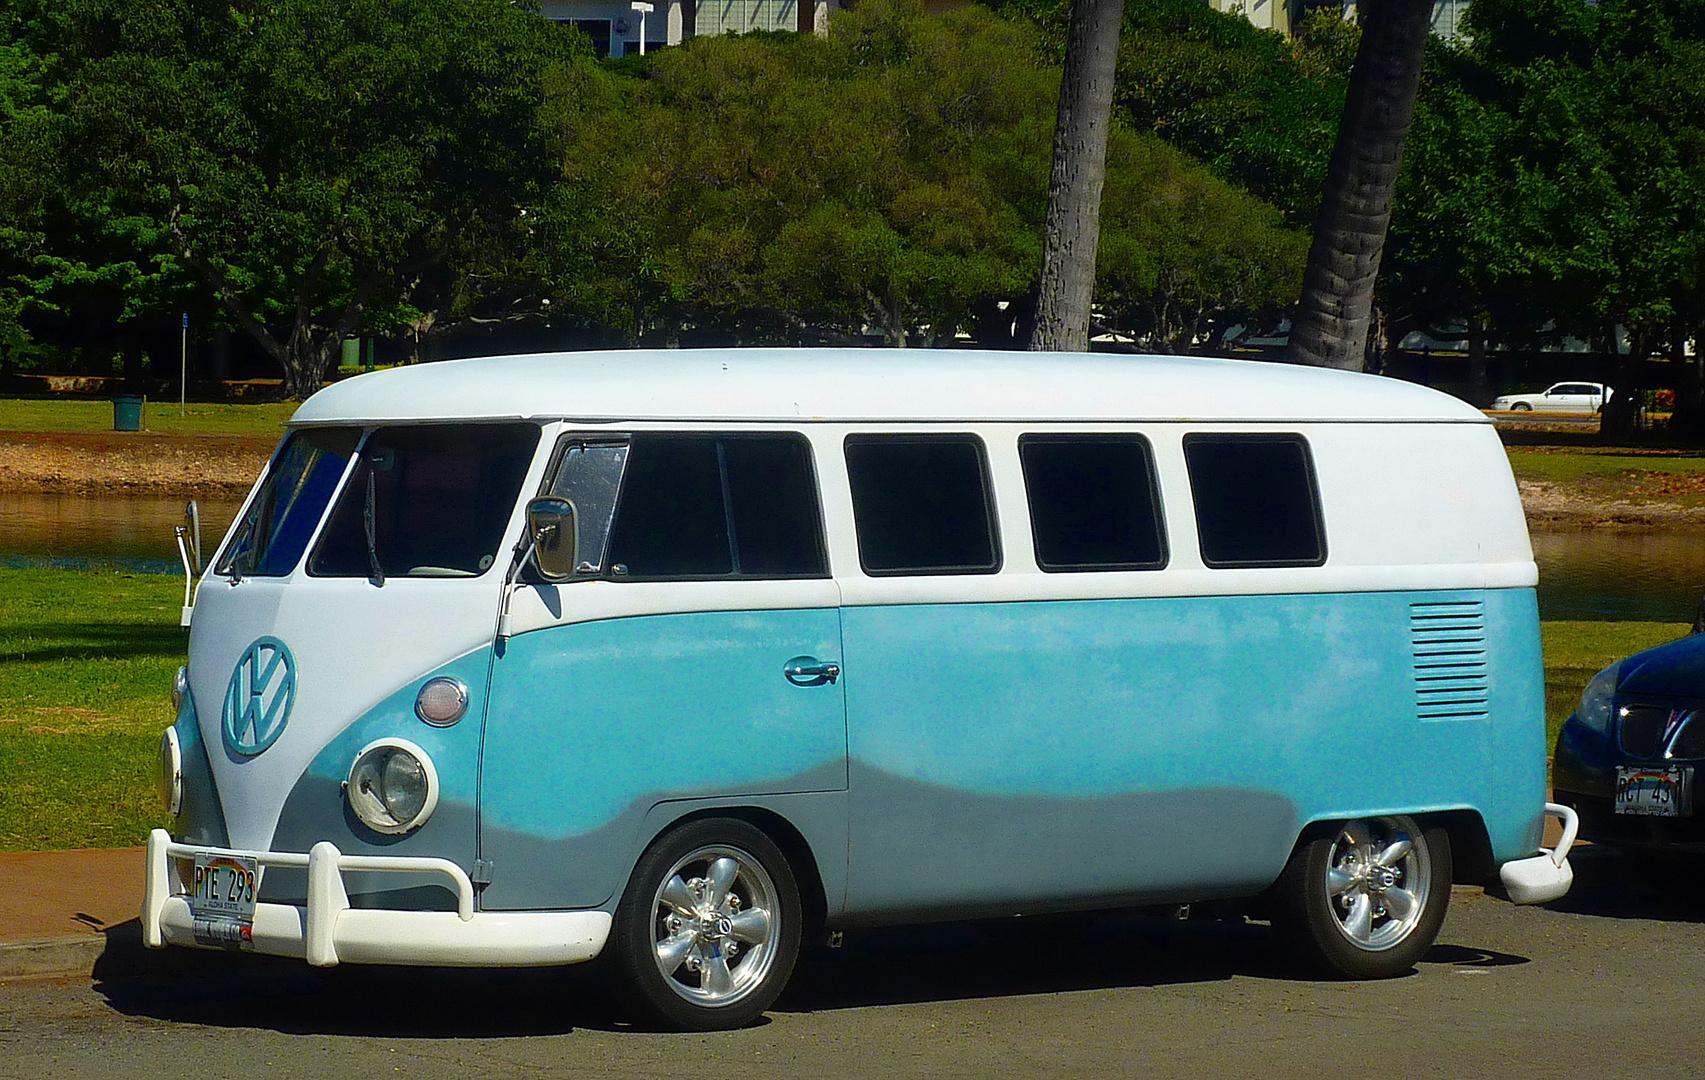 vw bulli t1 in honolulu hawaii foto bild autos zweir der oldtimer youngtimer vw bilder. Black Bedroom Furniture Sets. Home Design Ideas